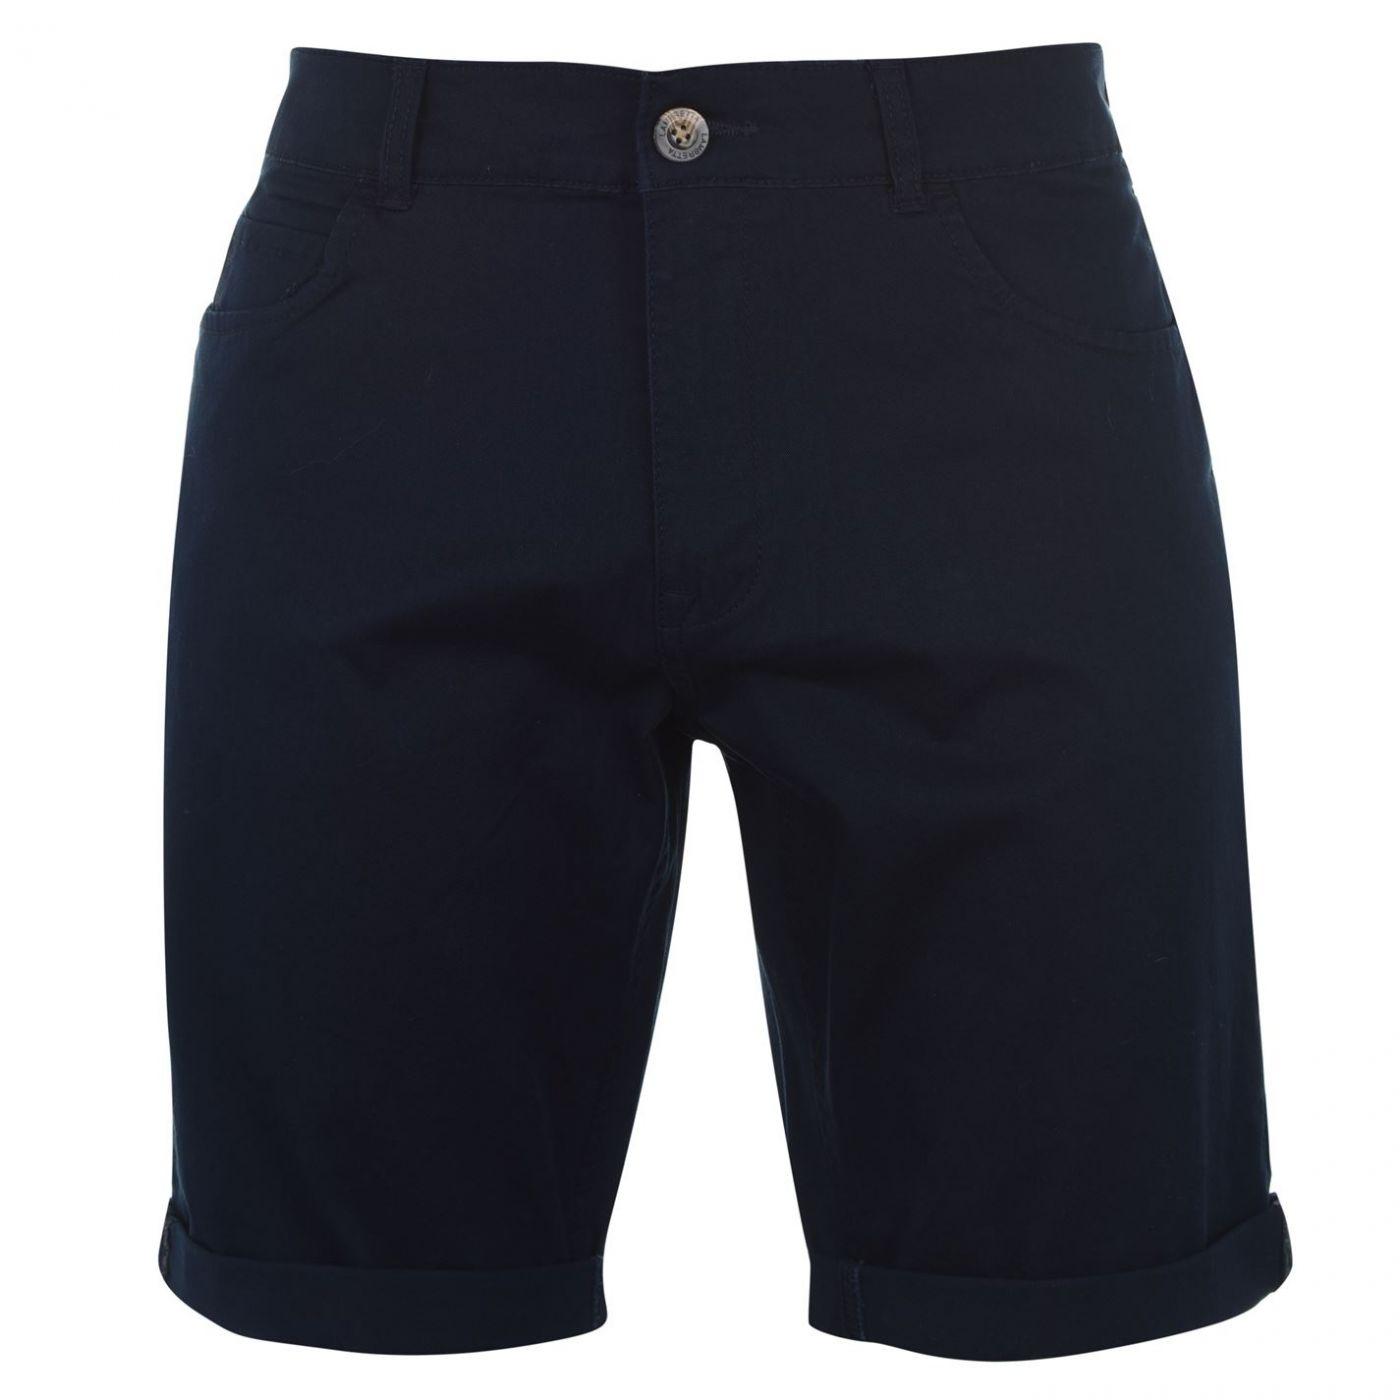 Lambretta Chino Shorts